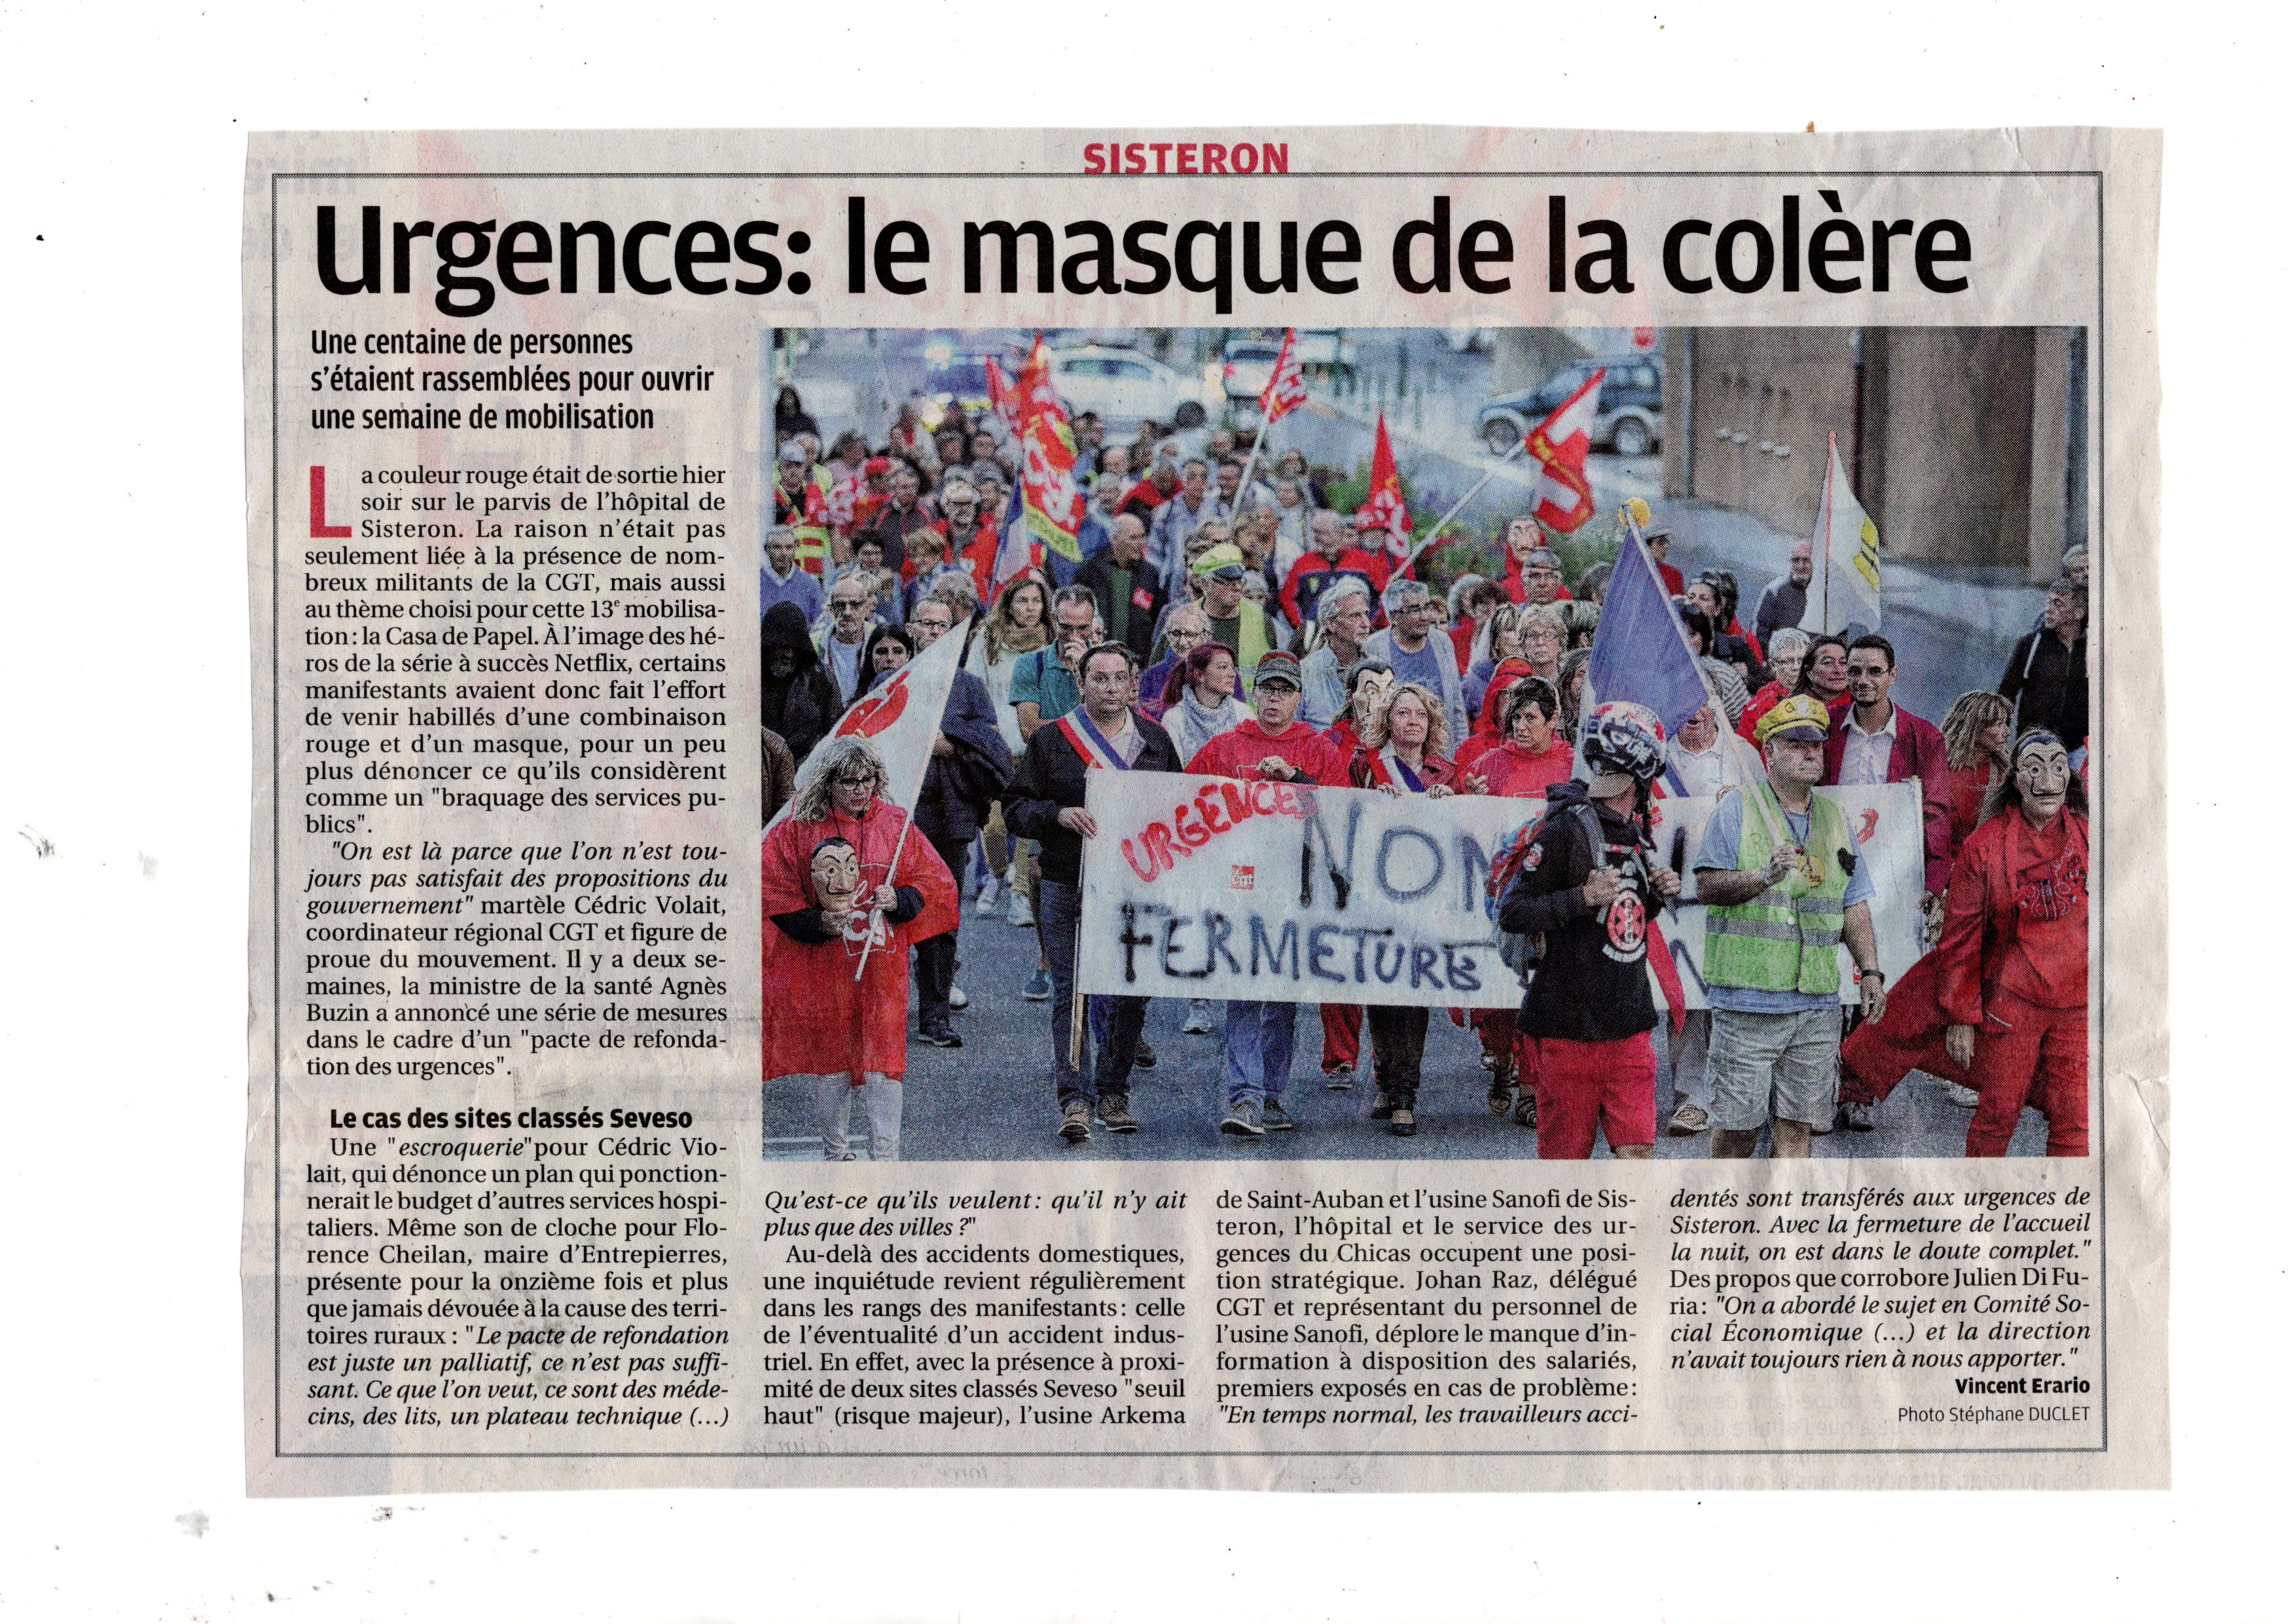 La Provence page 2 Urgences Sisteron Casa de Papel